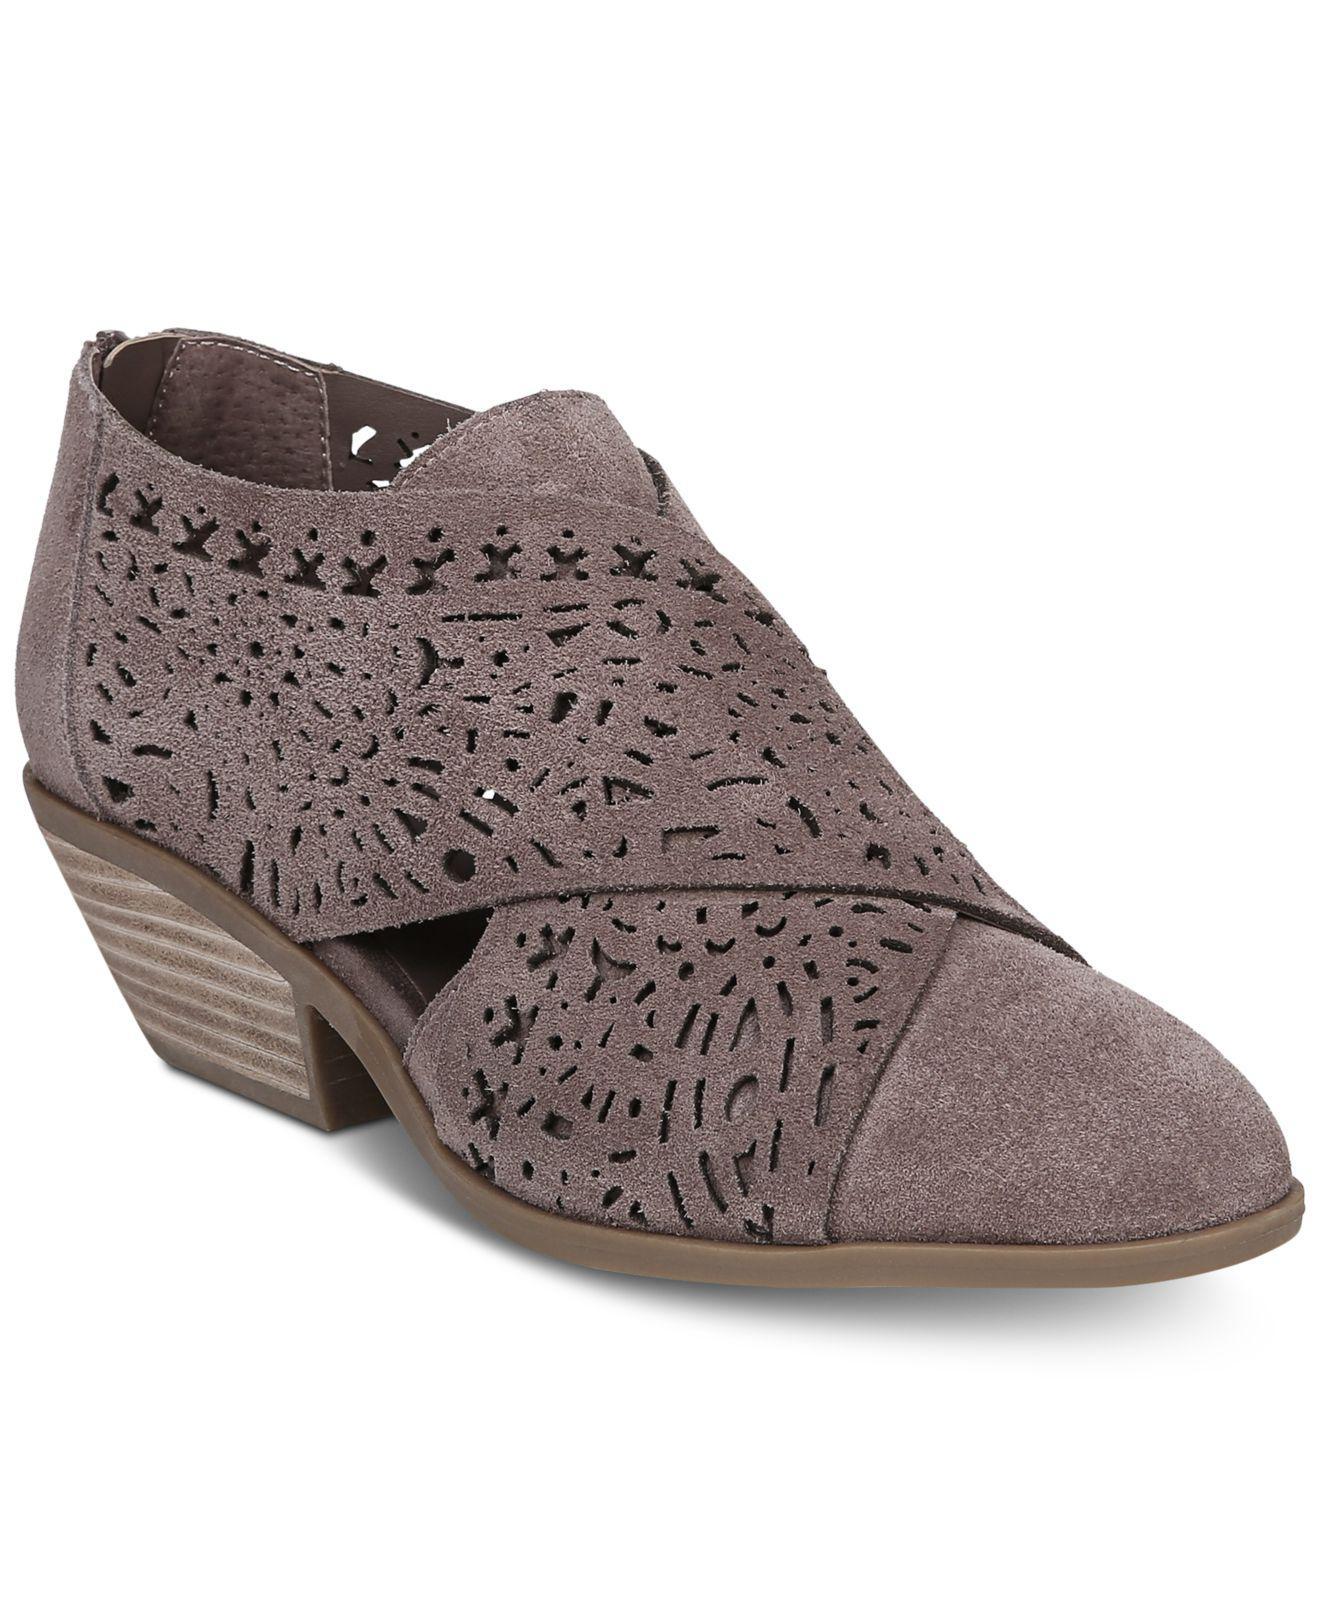 886688611db Carlos By Carlos Santana Miranda Ankle Booties - Save 2% - Lyst